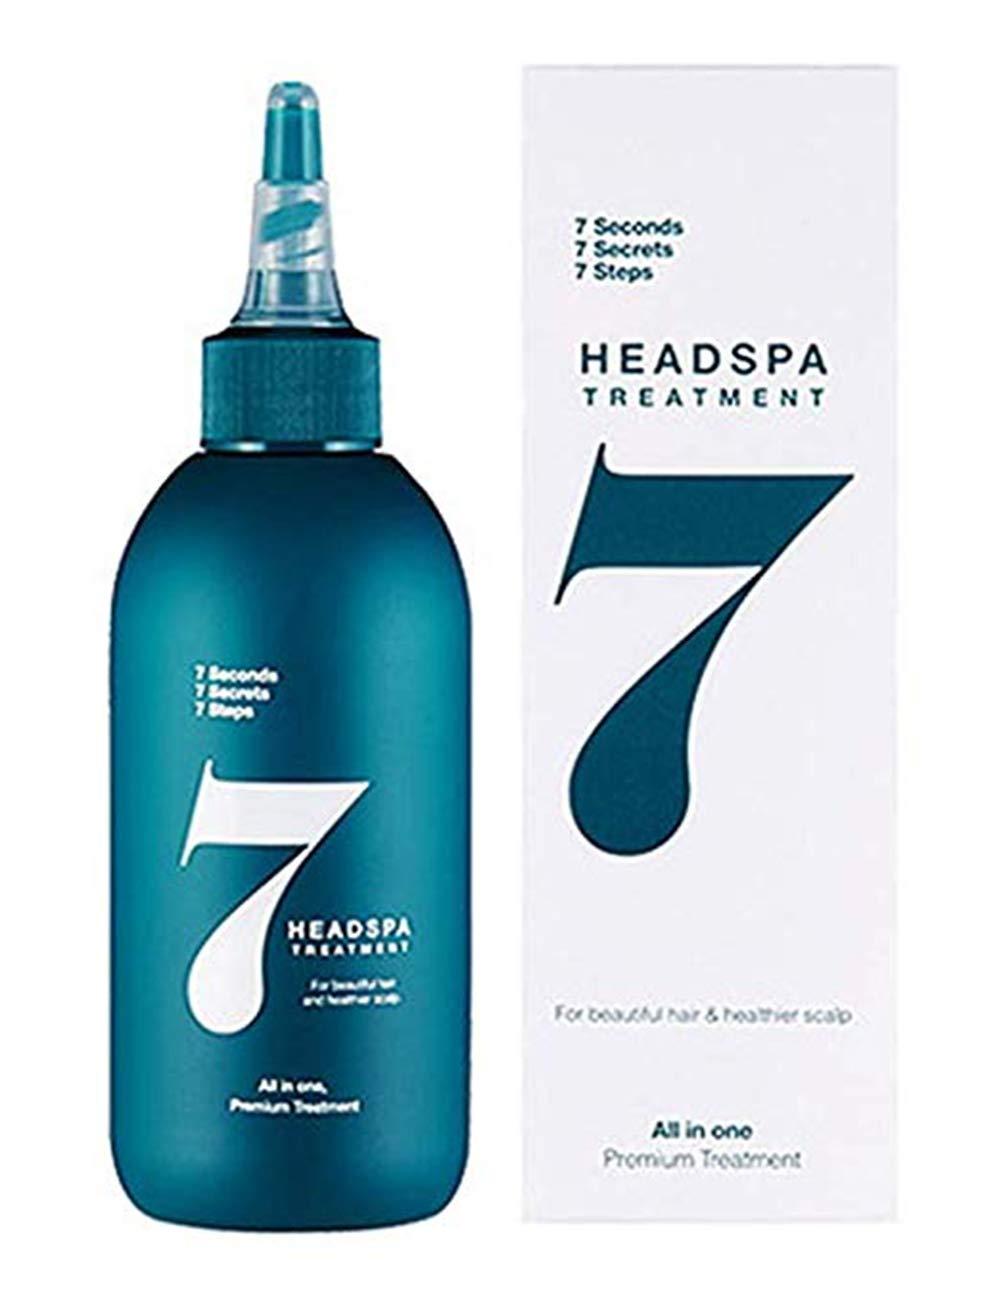 Headspa7 Anti-Thinning Treatment Hair Growth Conditioner Treatment for Hair Loss Natural Thickening Volume Conditioner for Fine Hair Volumizing Deep Treatment for Thinning Color Treated Hair, All Hair by Headspa7